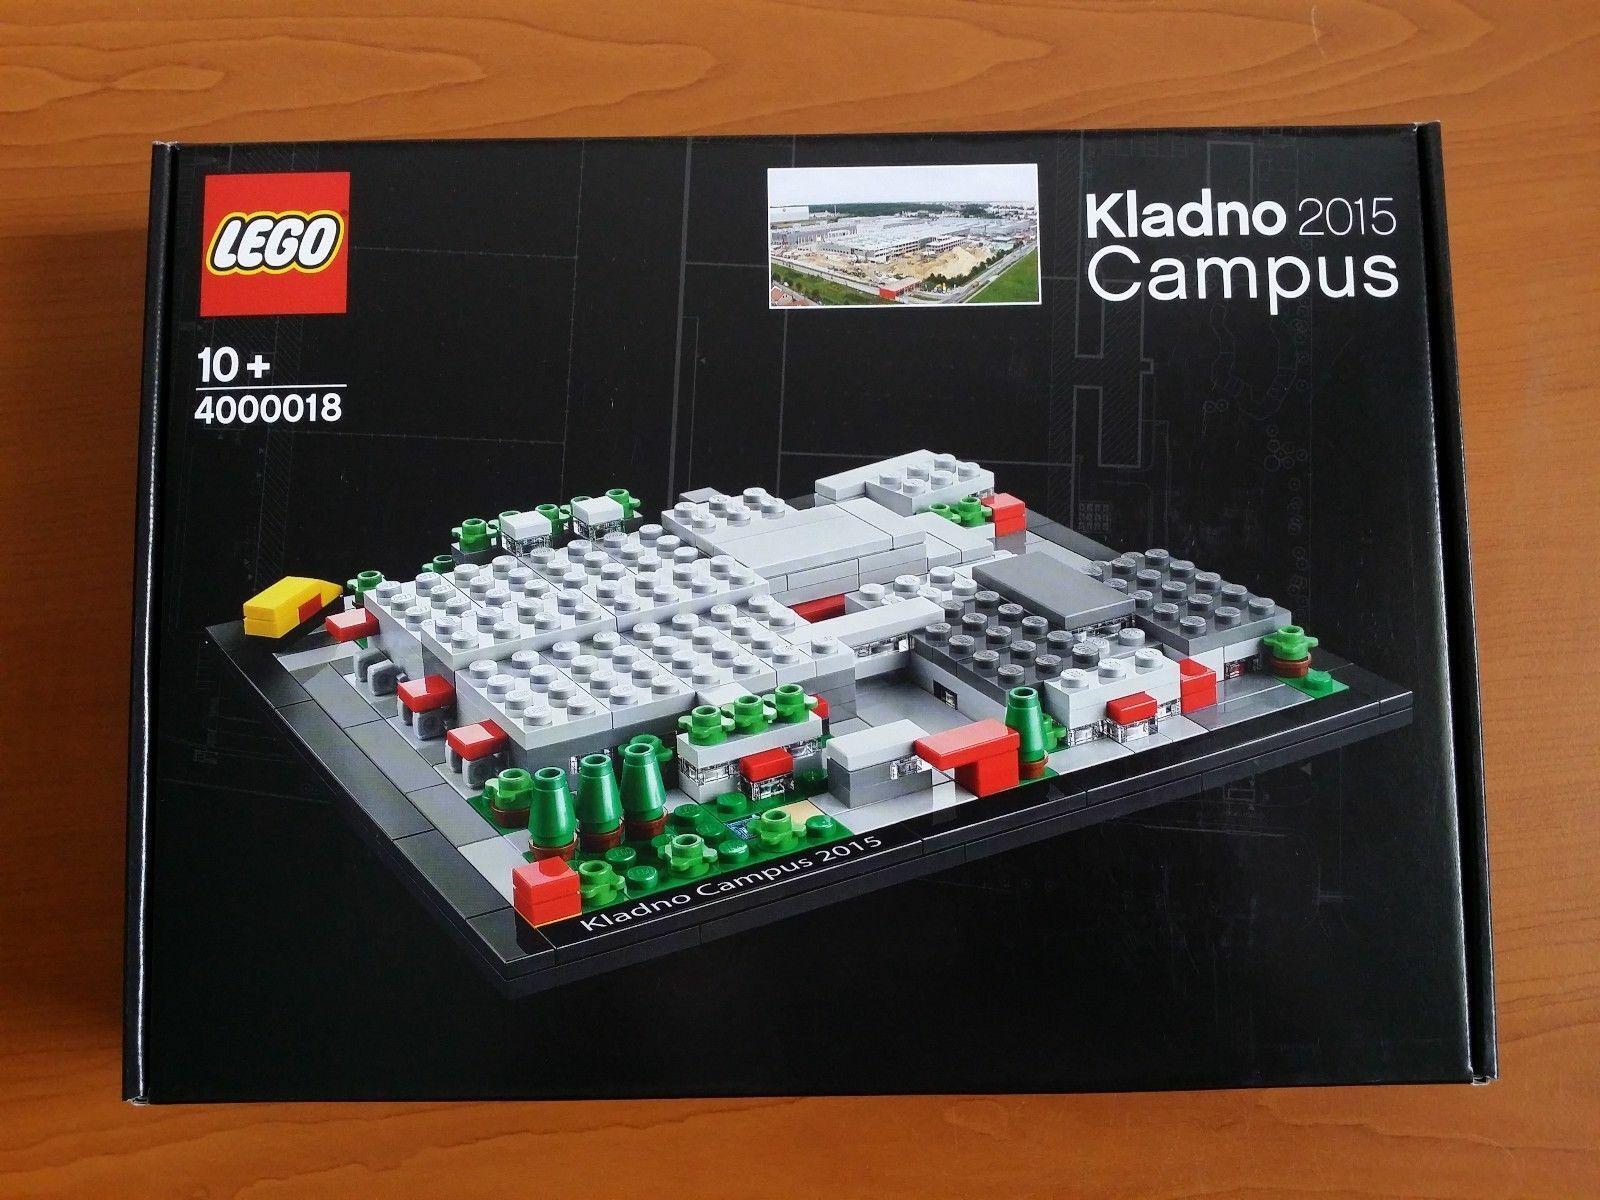 Lego Lego Lego KLADNO CAMPUS 4000018  2015 simiraily  4002014 4002015 4002016 4002018 526f55